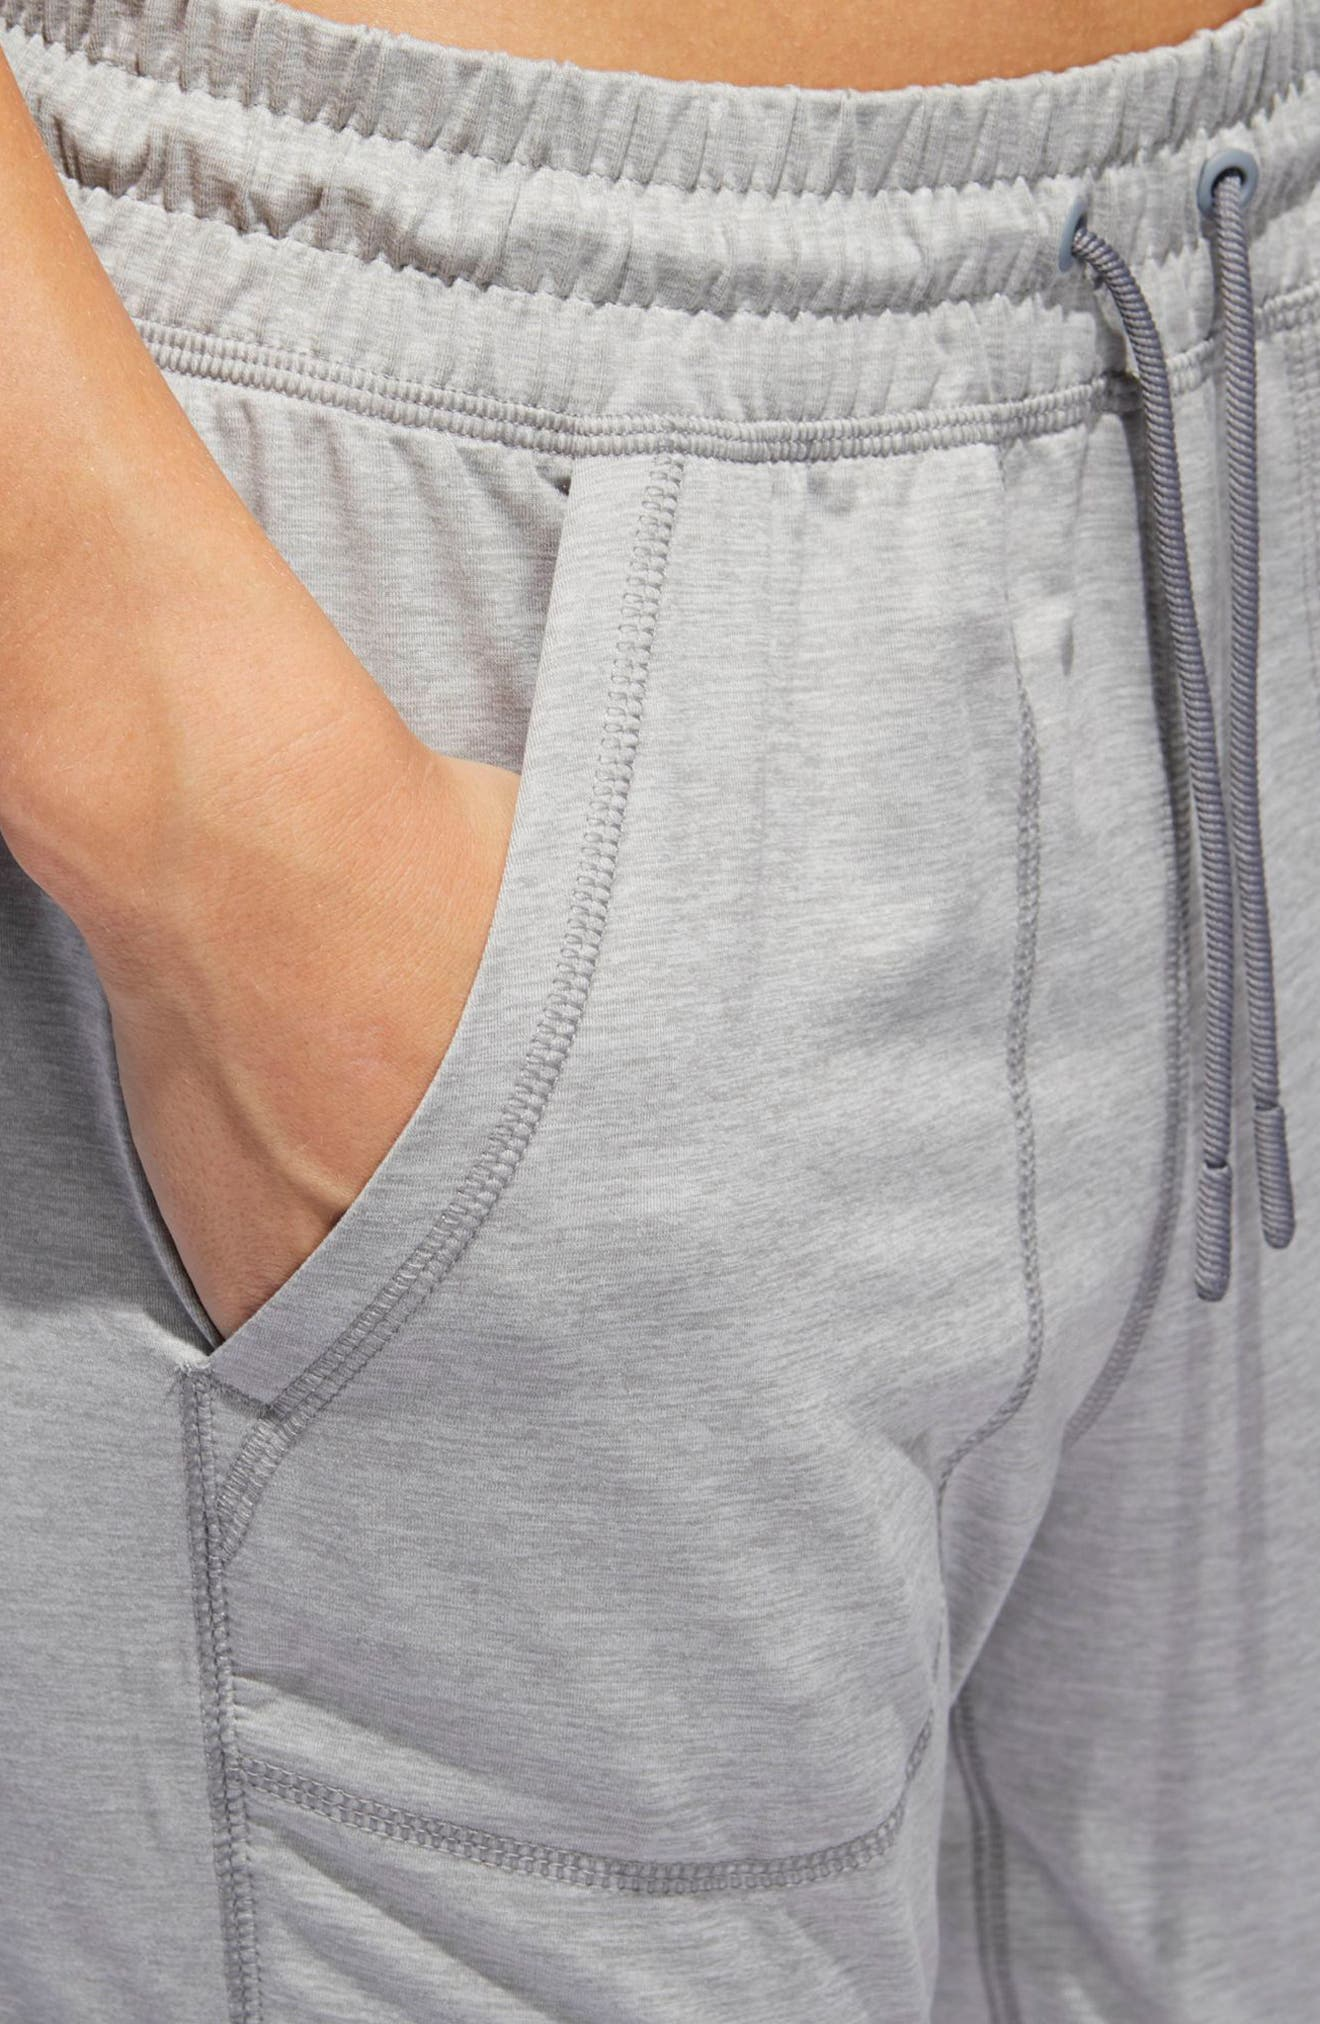 ID LBD Jogger Pants,                             Alternate thumbnail 4, color,                             Medium Grey Heather